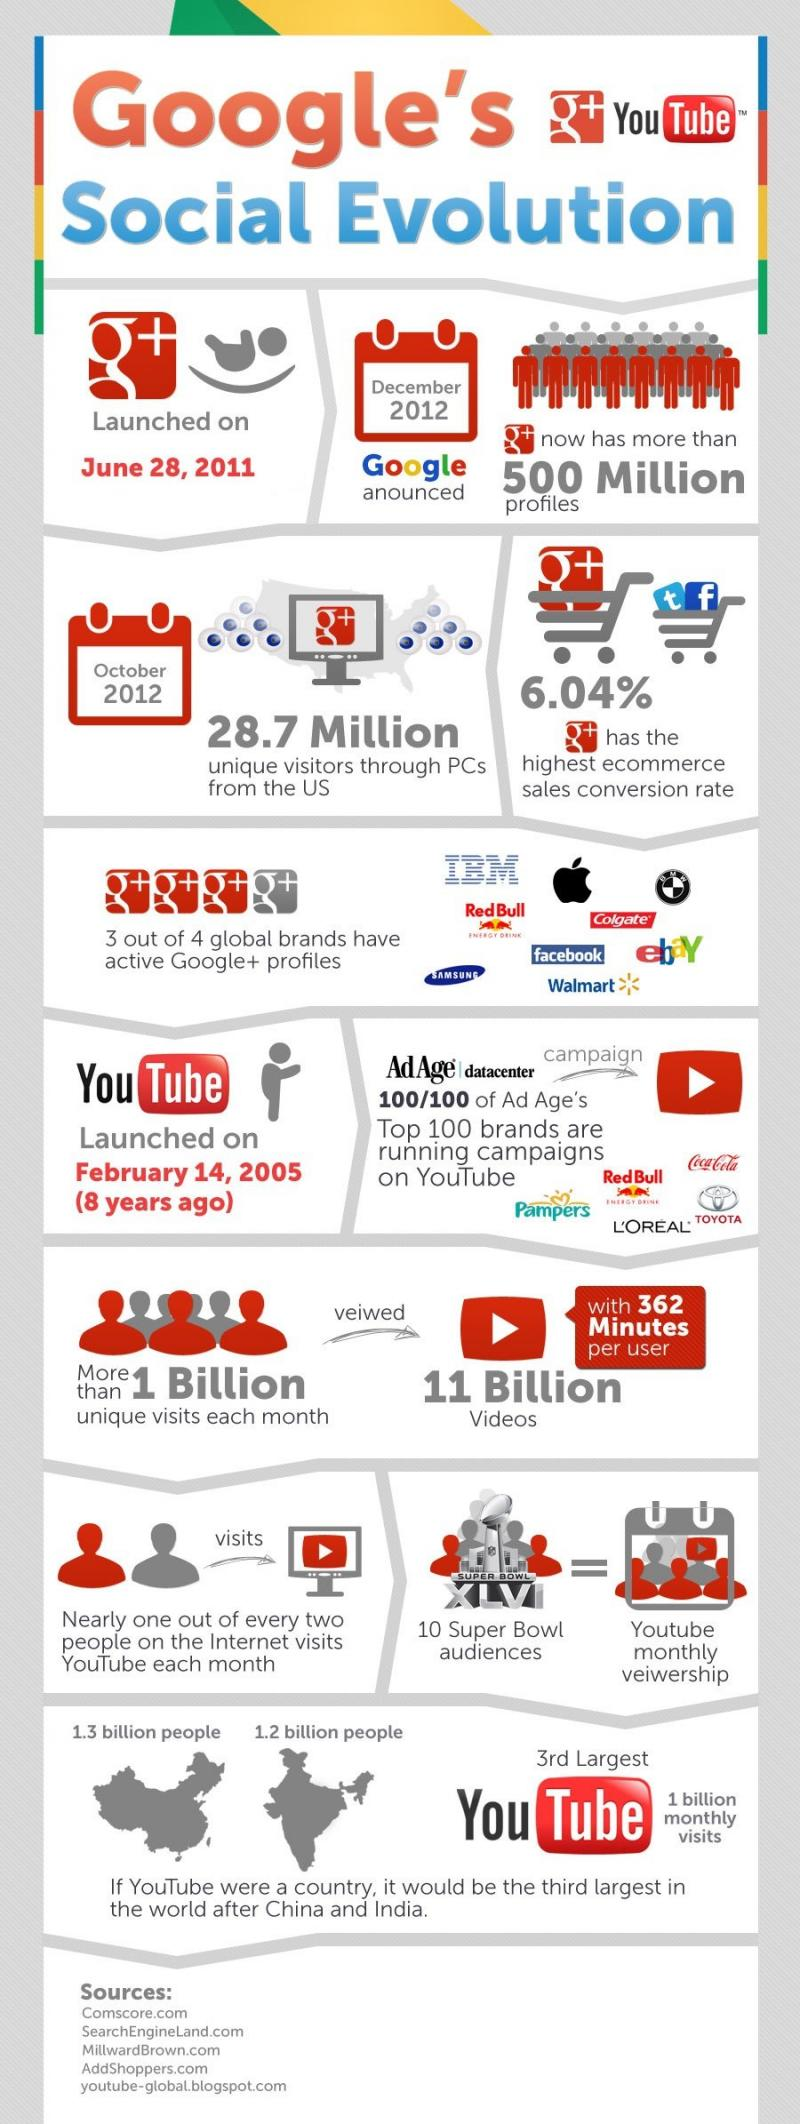 Google's social evolution #infographic